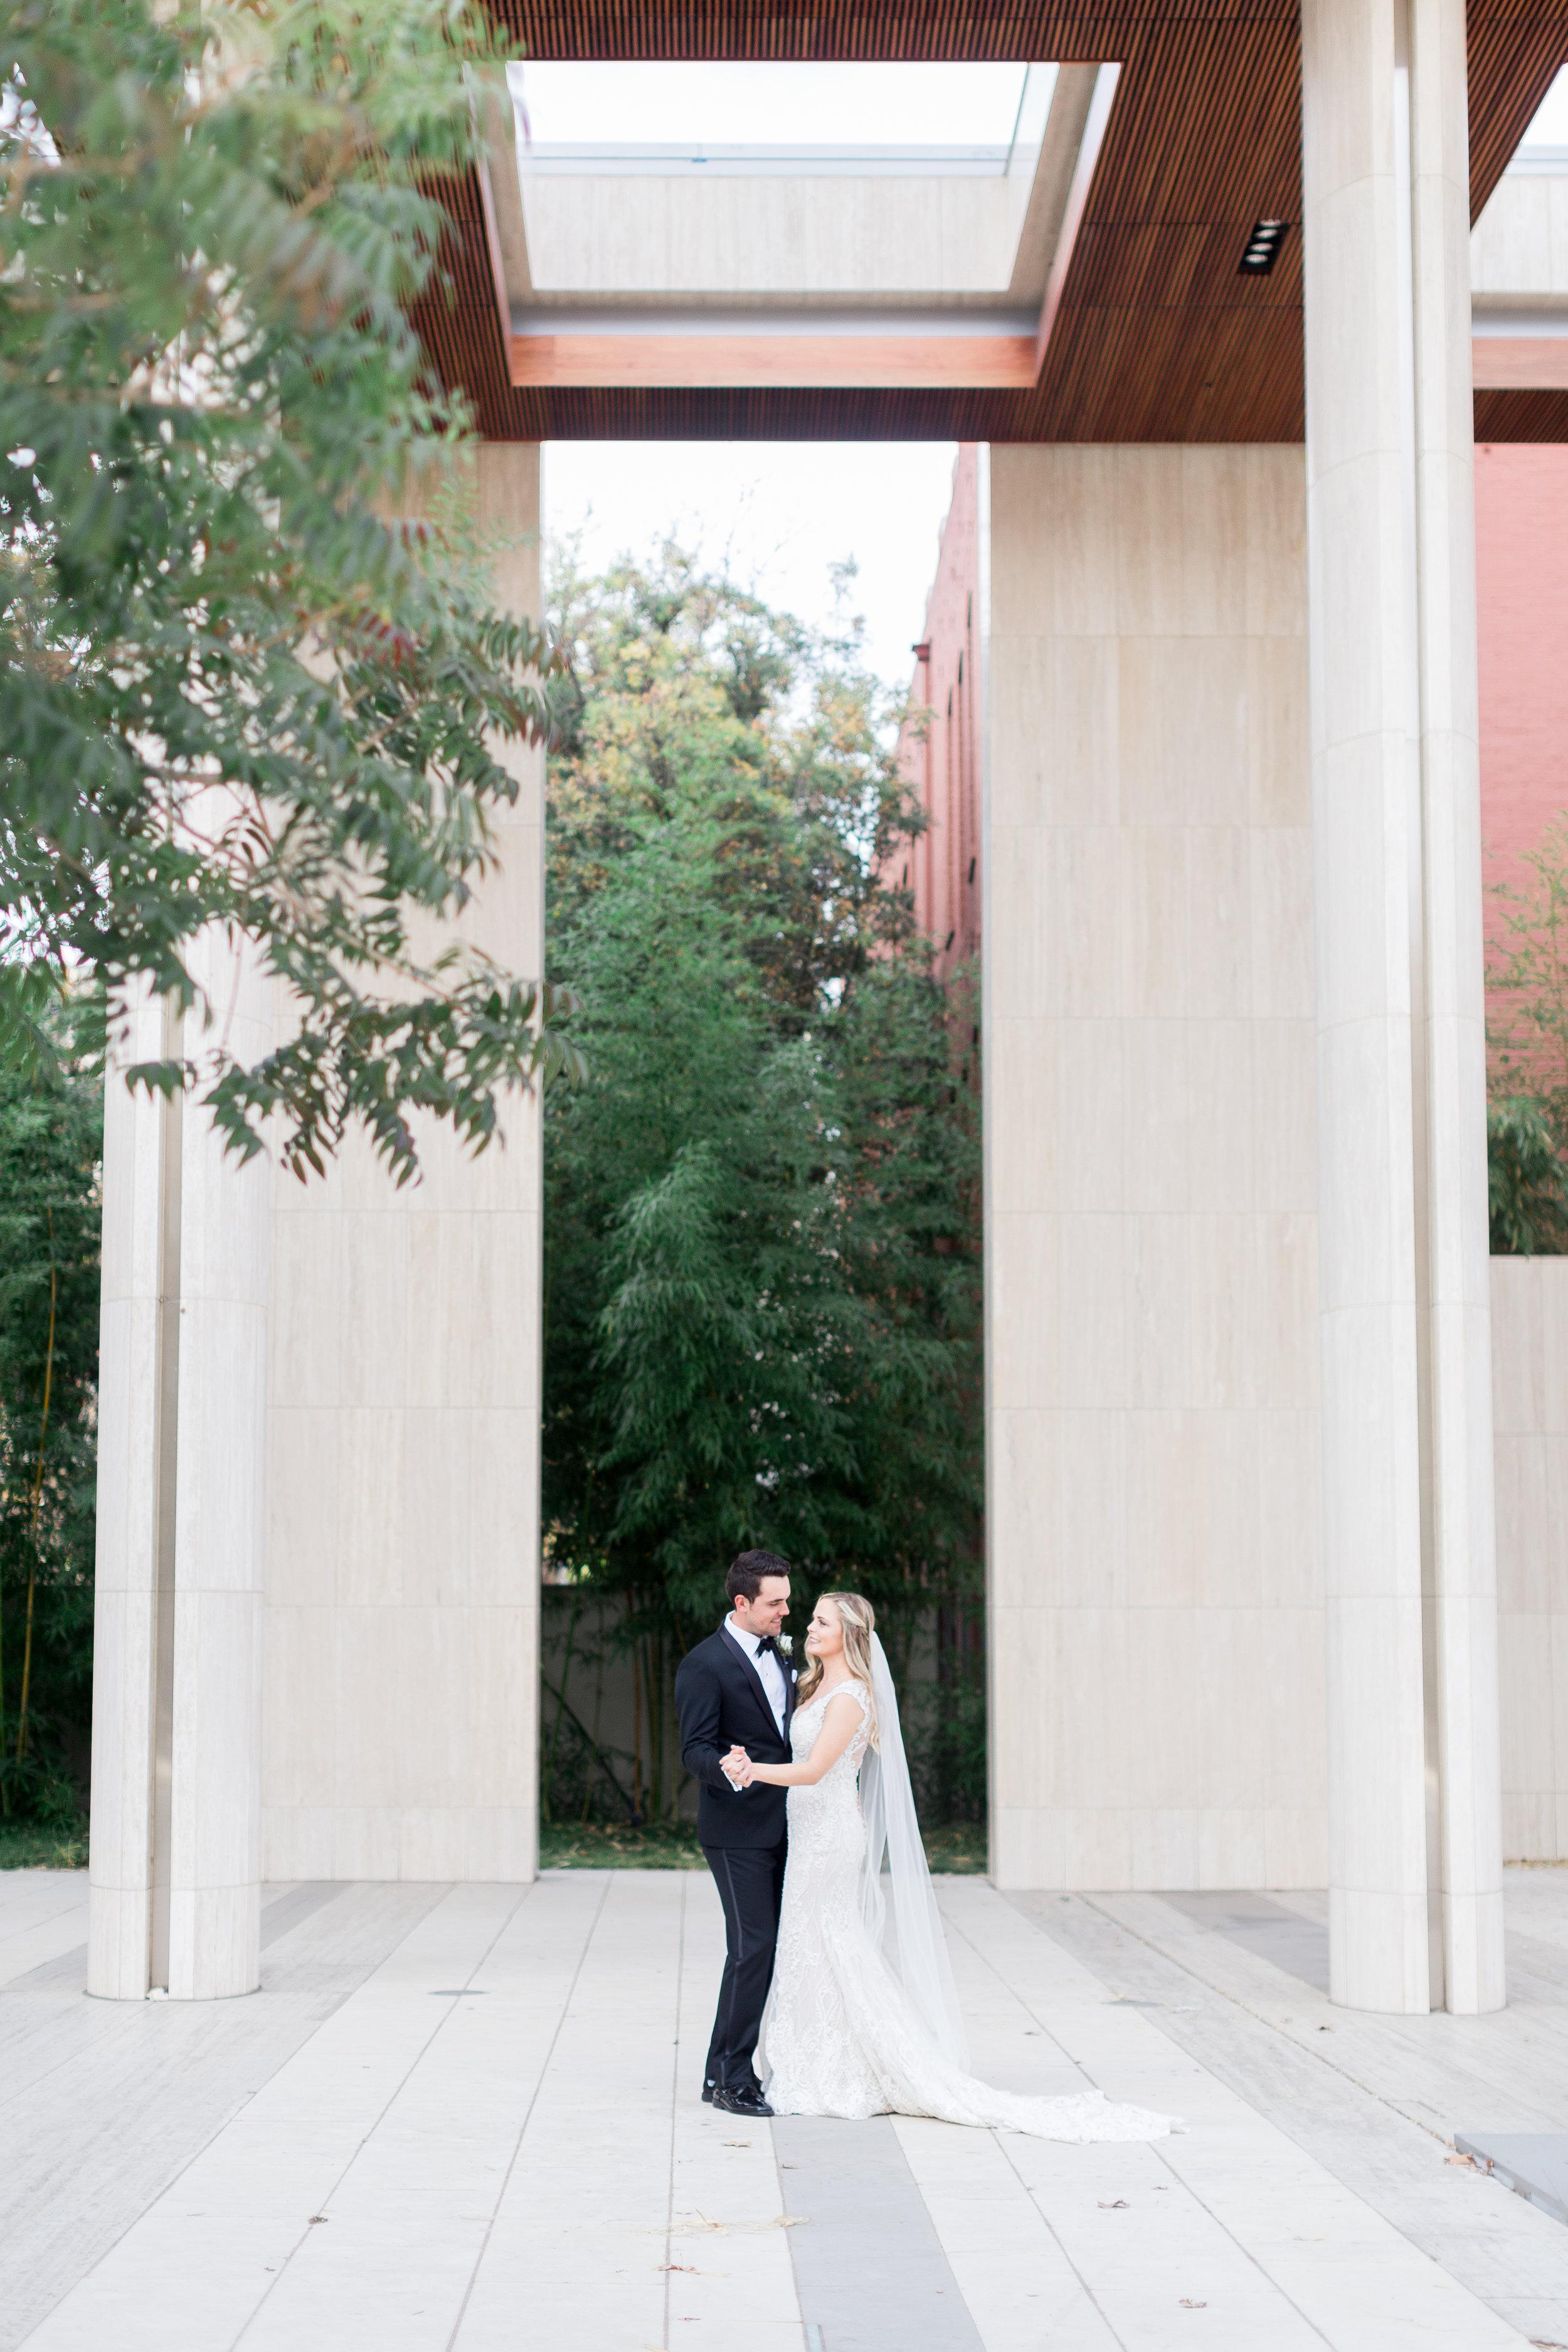 Downtown-San-Jose-wedding-photographer (86 of 335).jpg